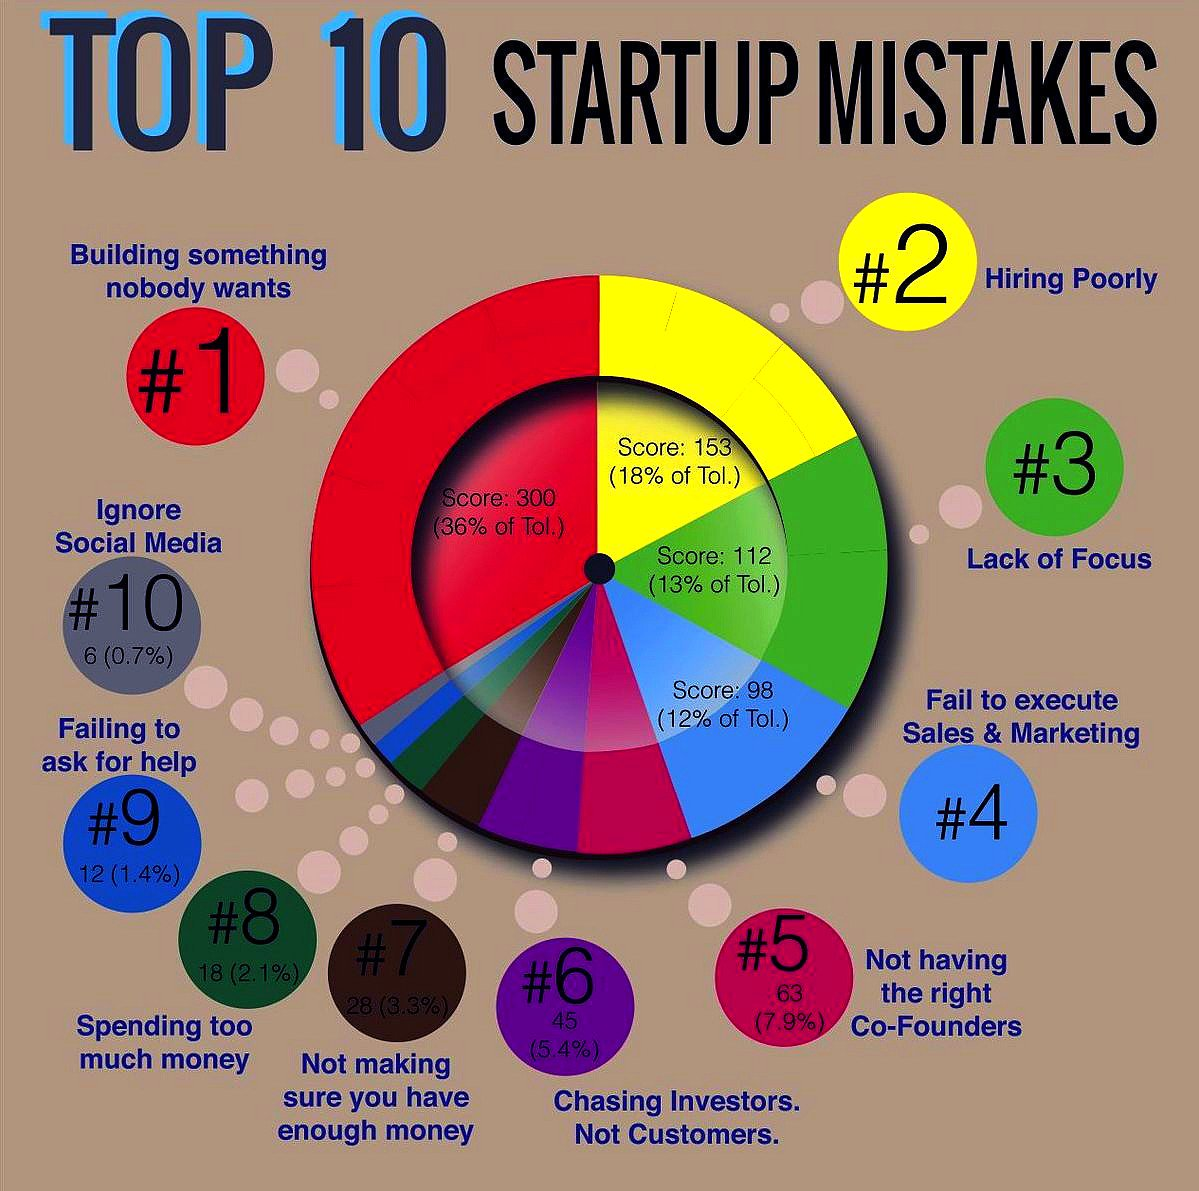 The Top 10 #Startups Mistakes [Infographic]  #Business #Startup #Entrepreneur #ContentMarketing #DigitalMarketing<br>http://pic.twitter.com/u7DFsTjyMt